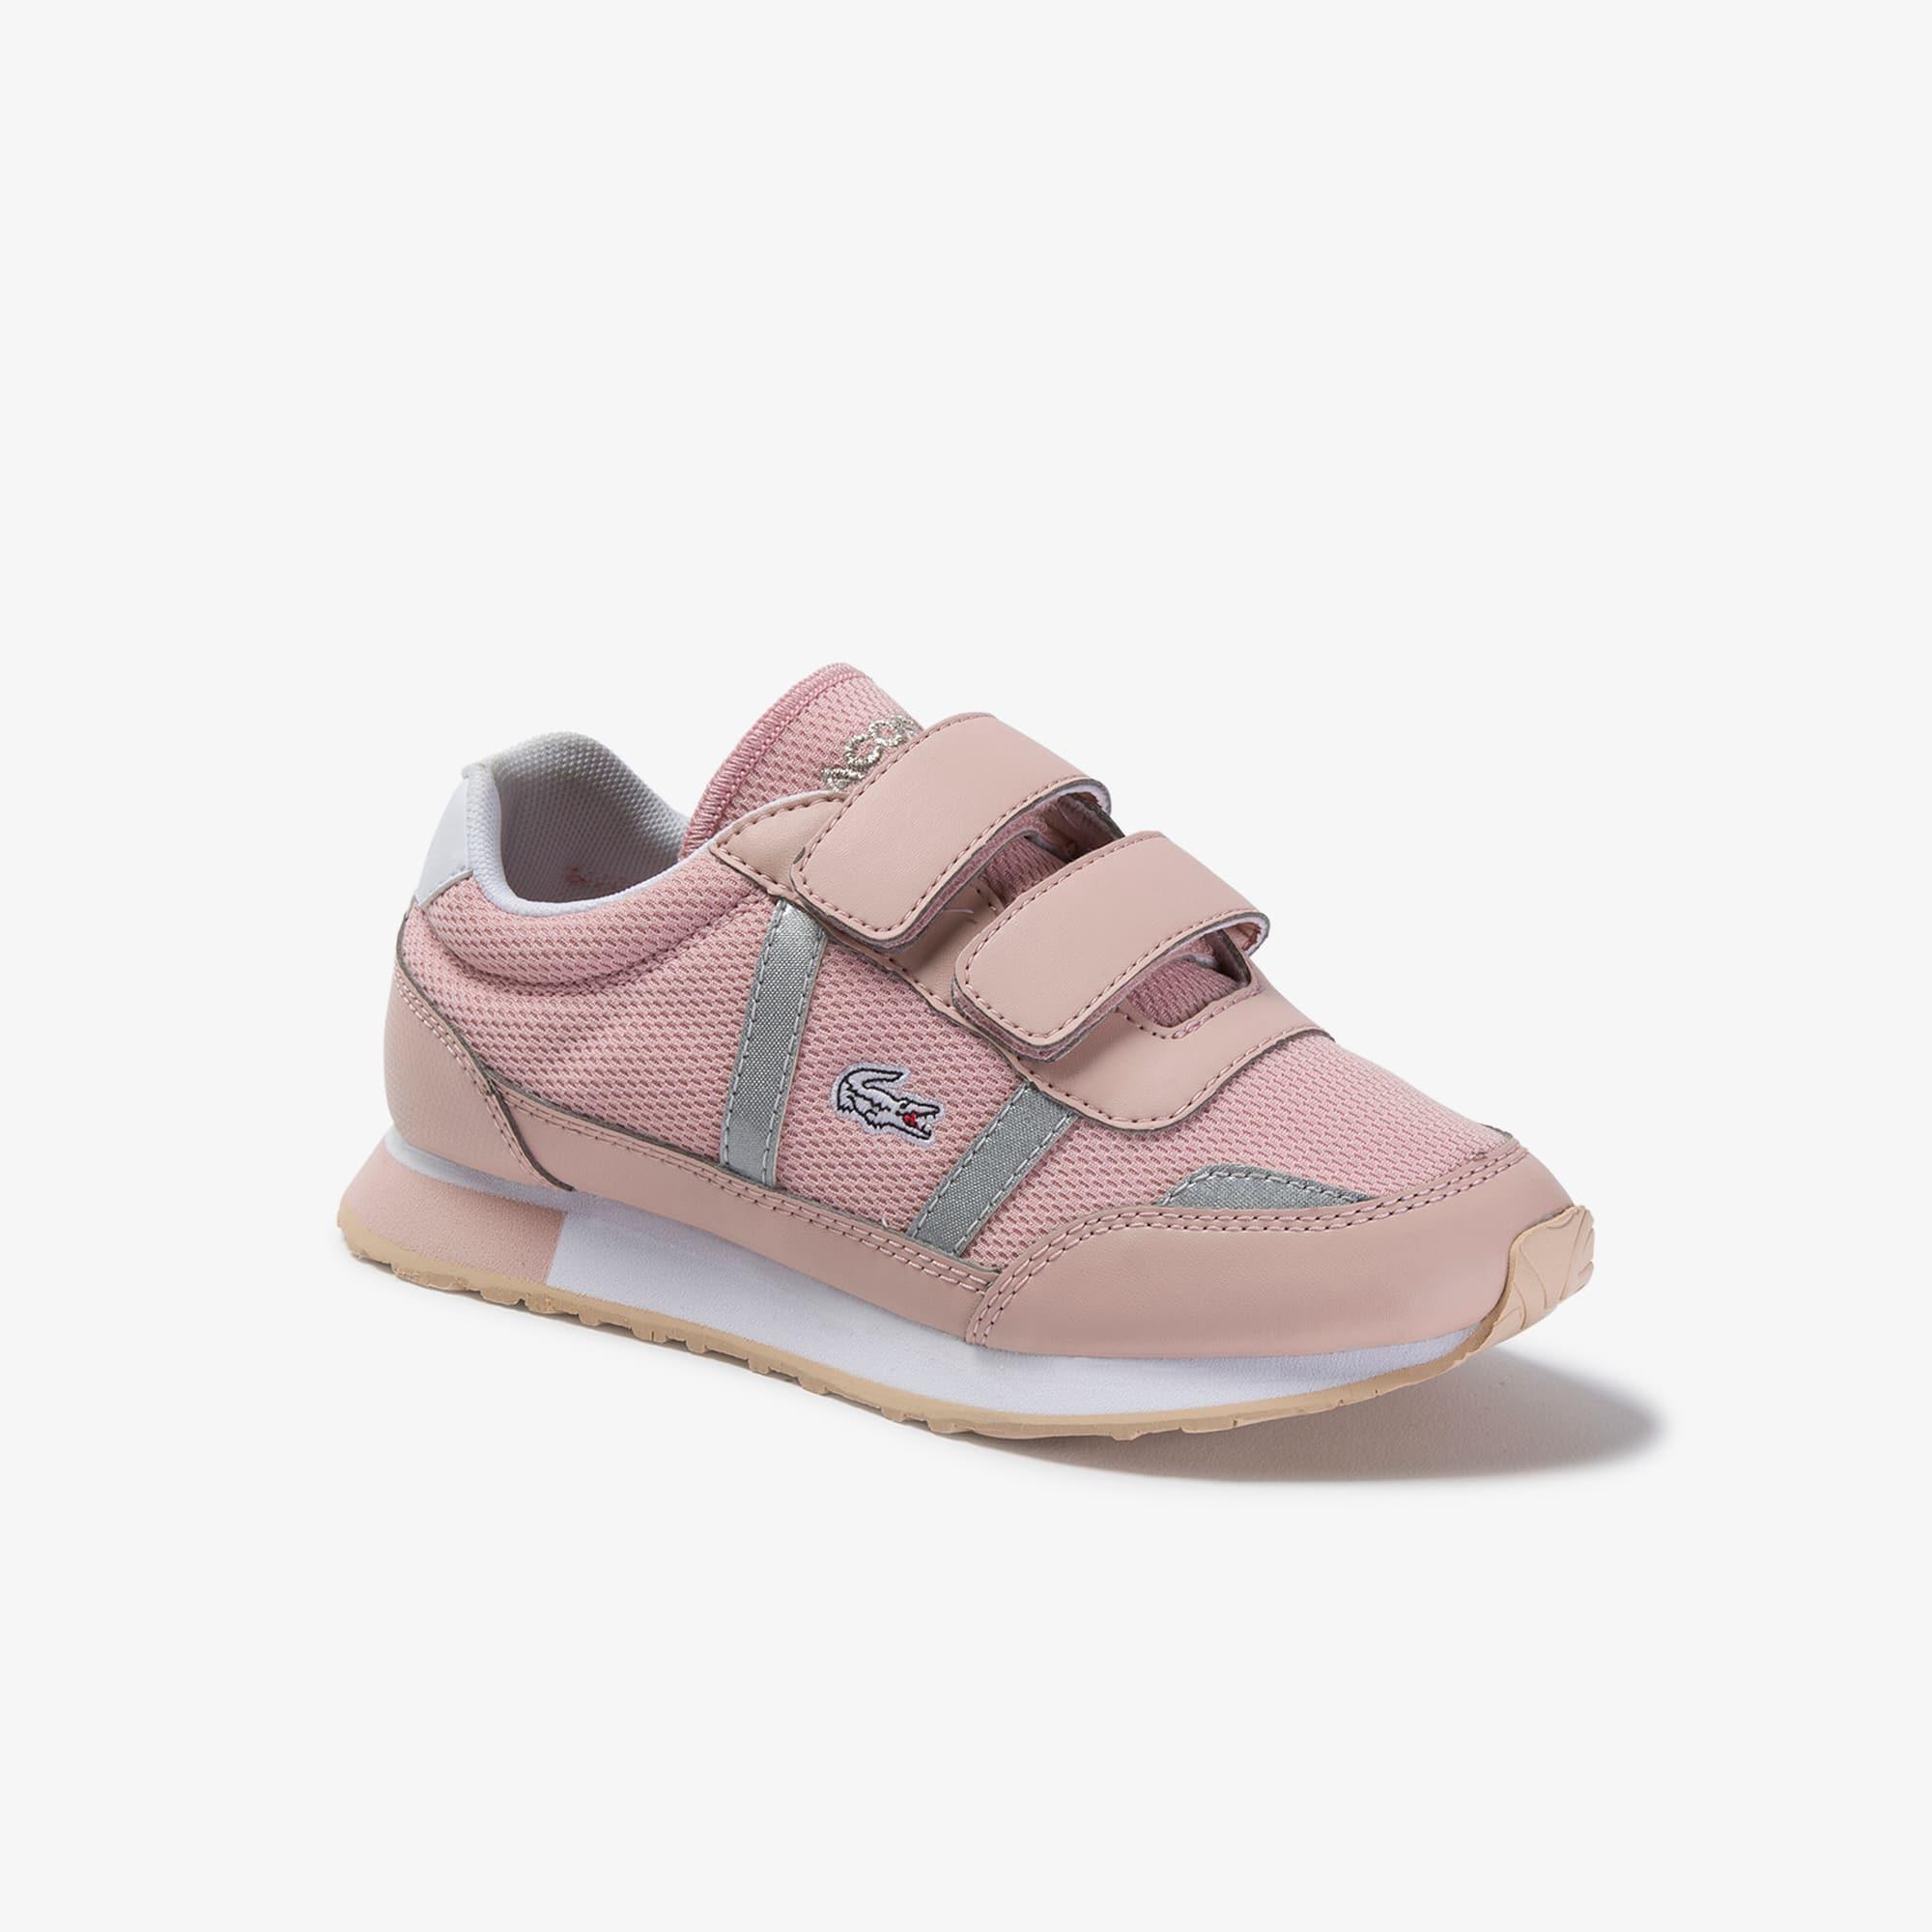 Kinder-Sneakers PARTNER aus Textil und Synthetik